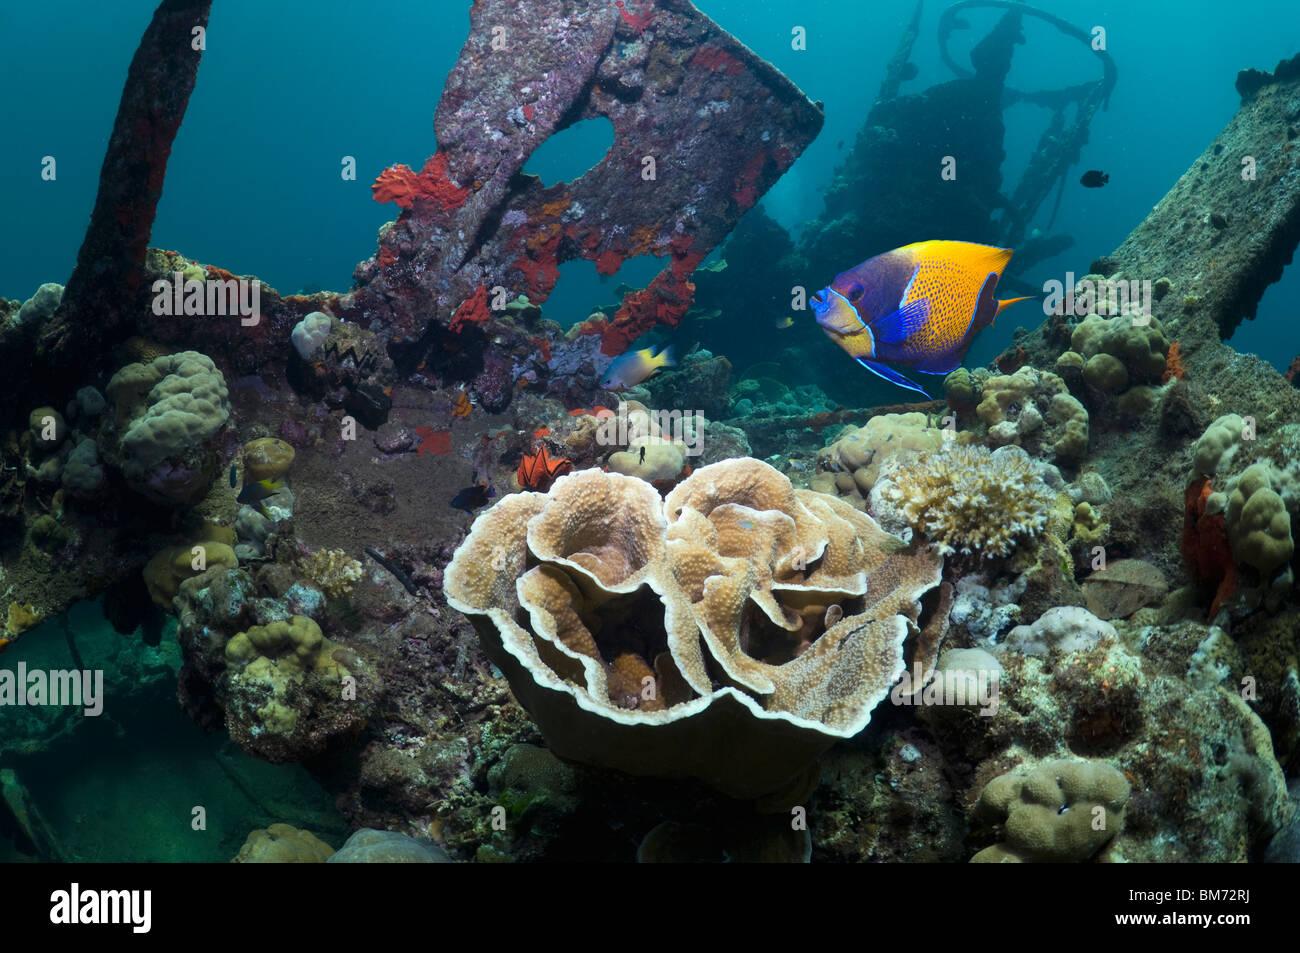 Kasi Maru wreck overgrown with corals.  Solomon Islands. - Stock Image